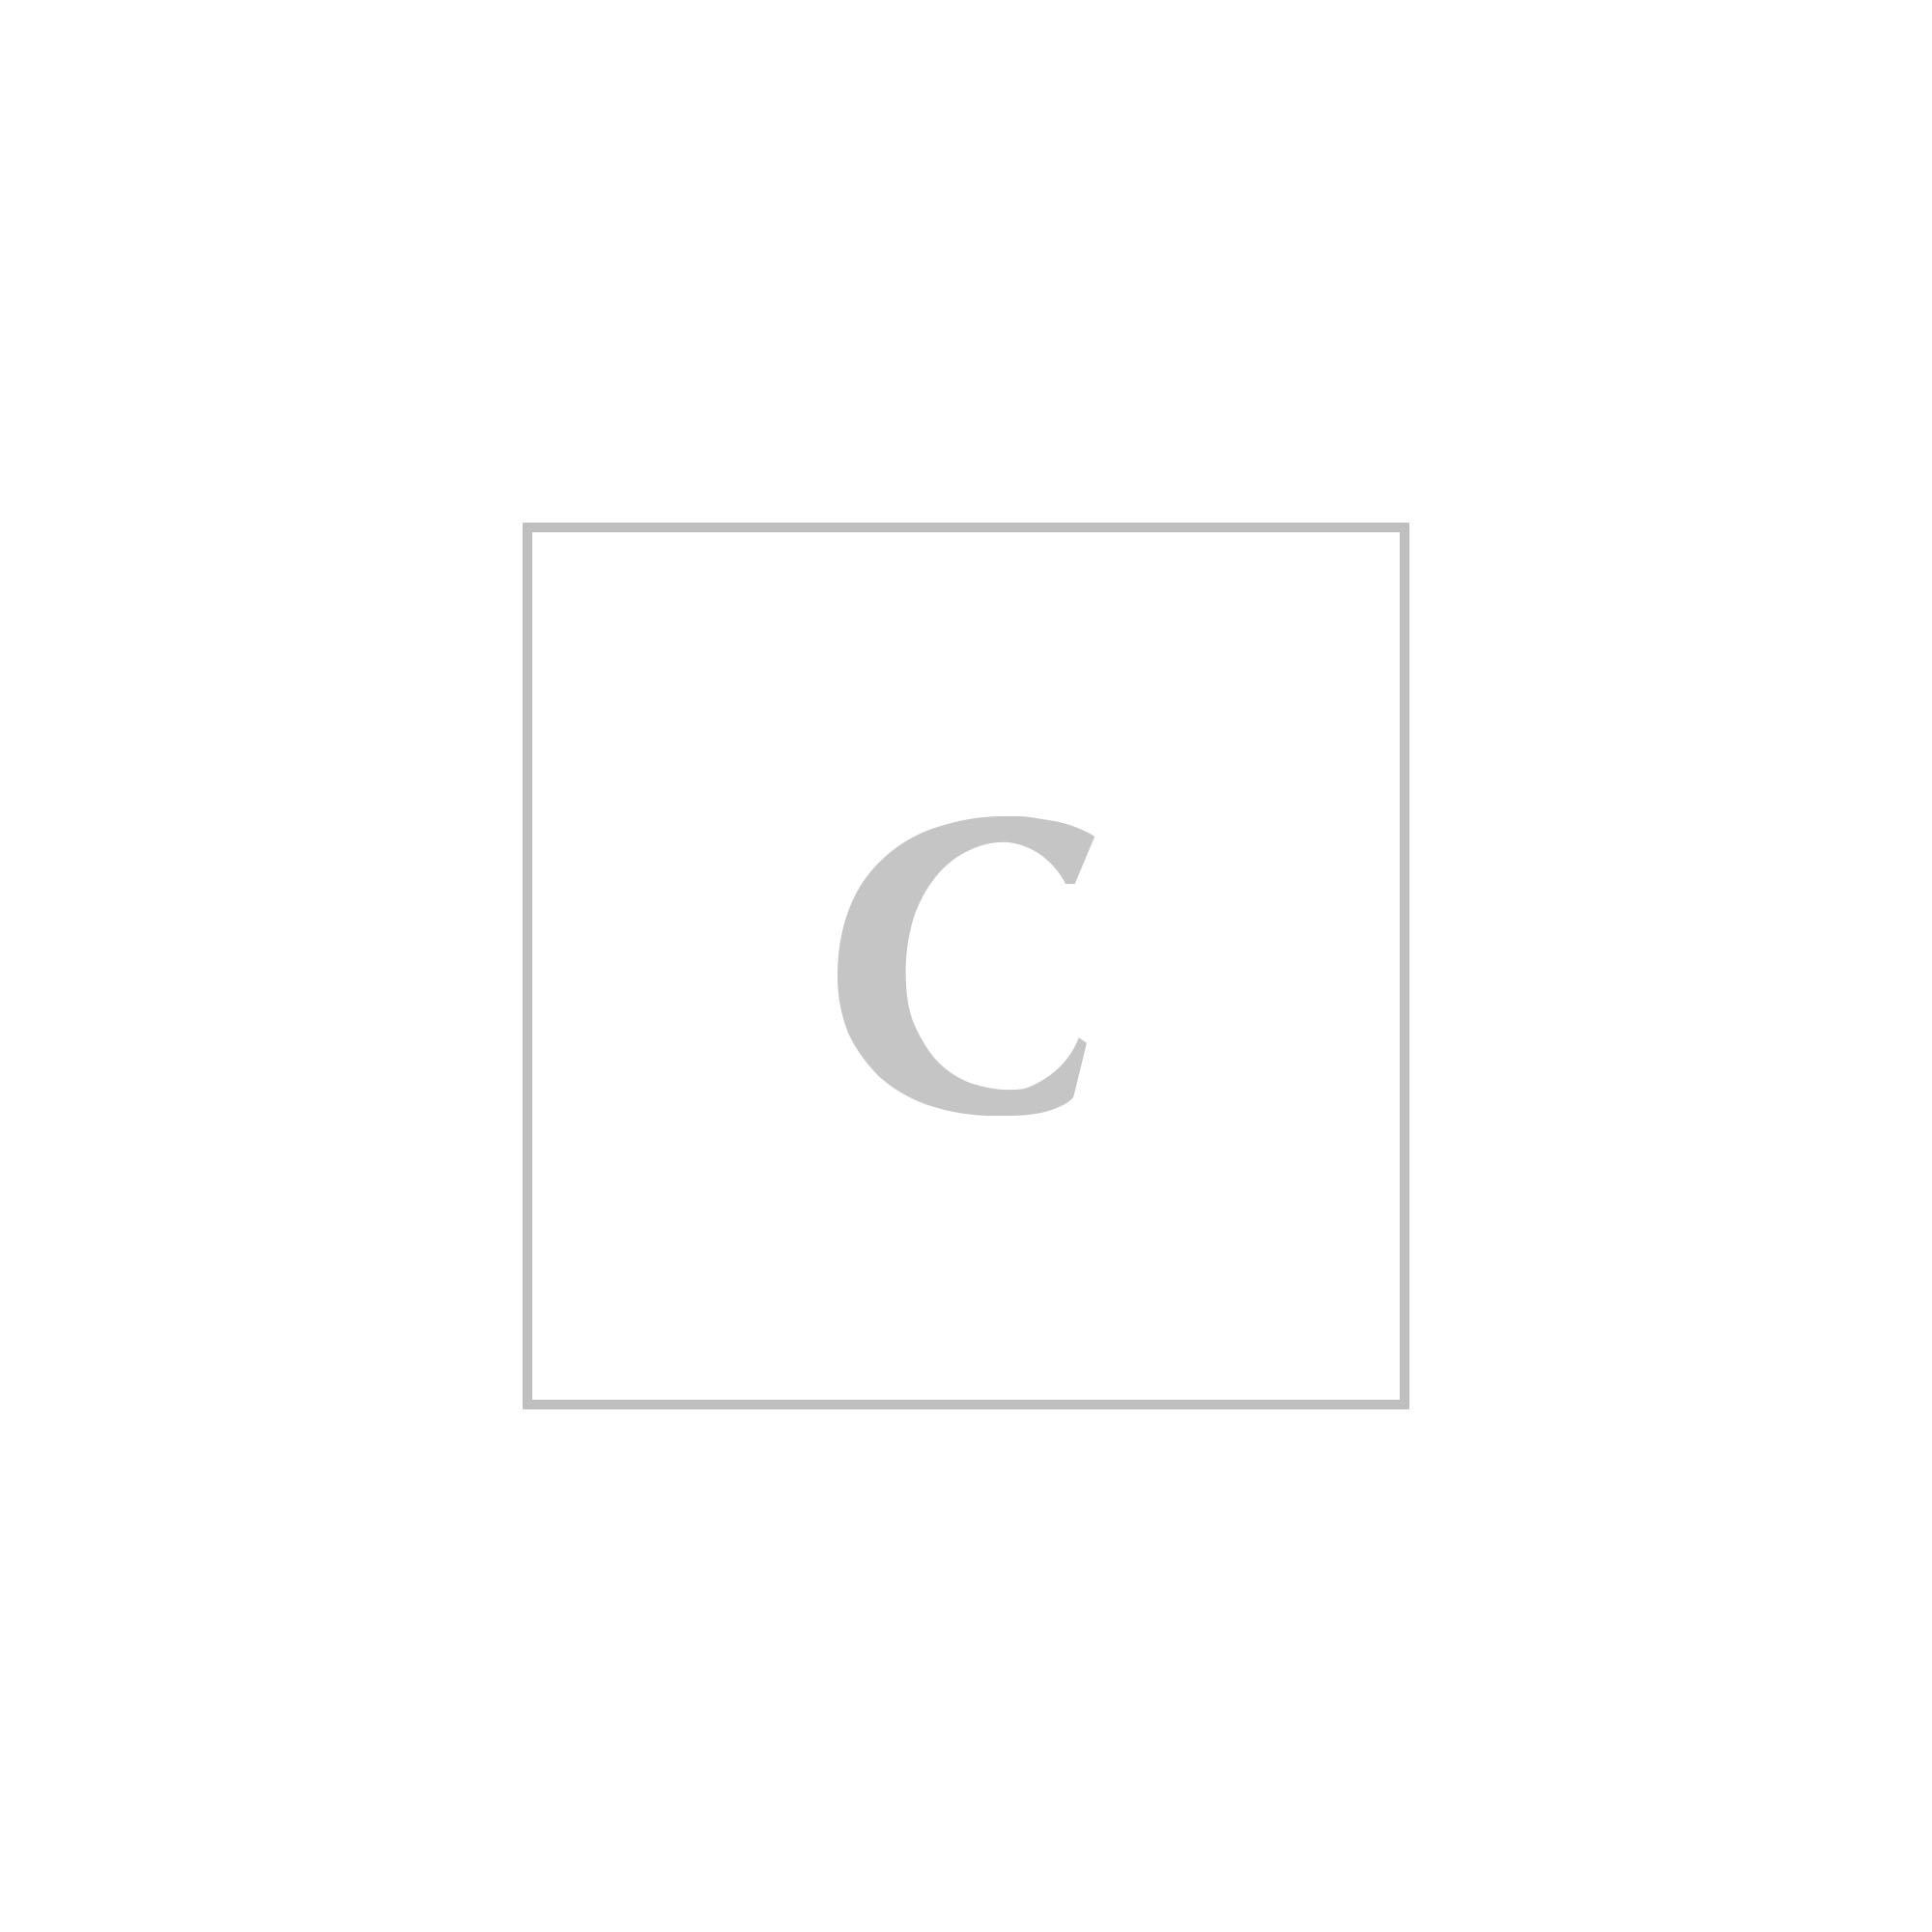 1f2aad881847 Wallets Michael Michael Kors for Donna Colori Misti